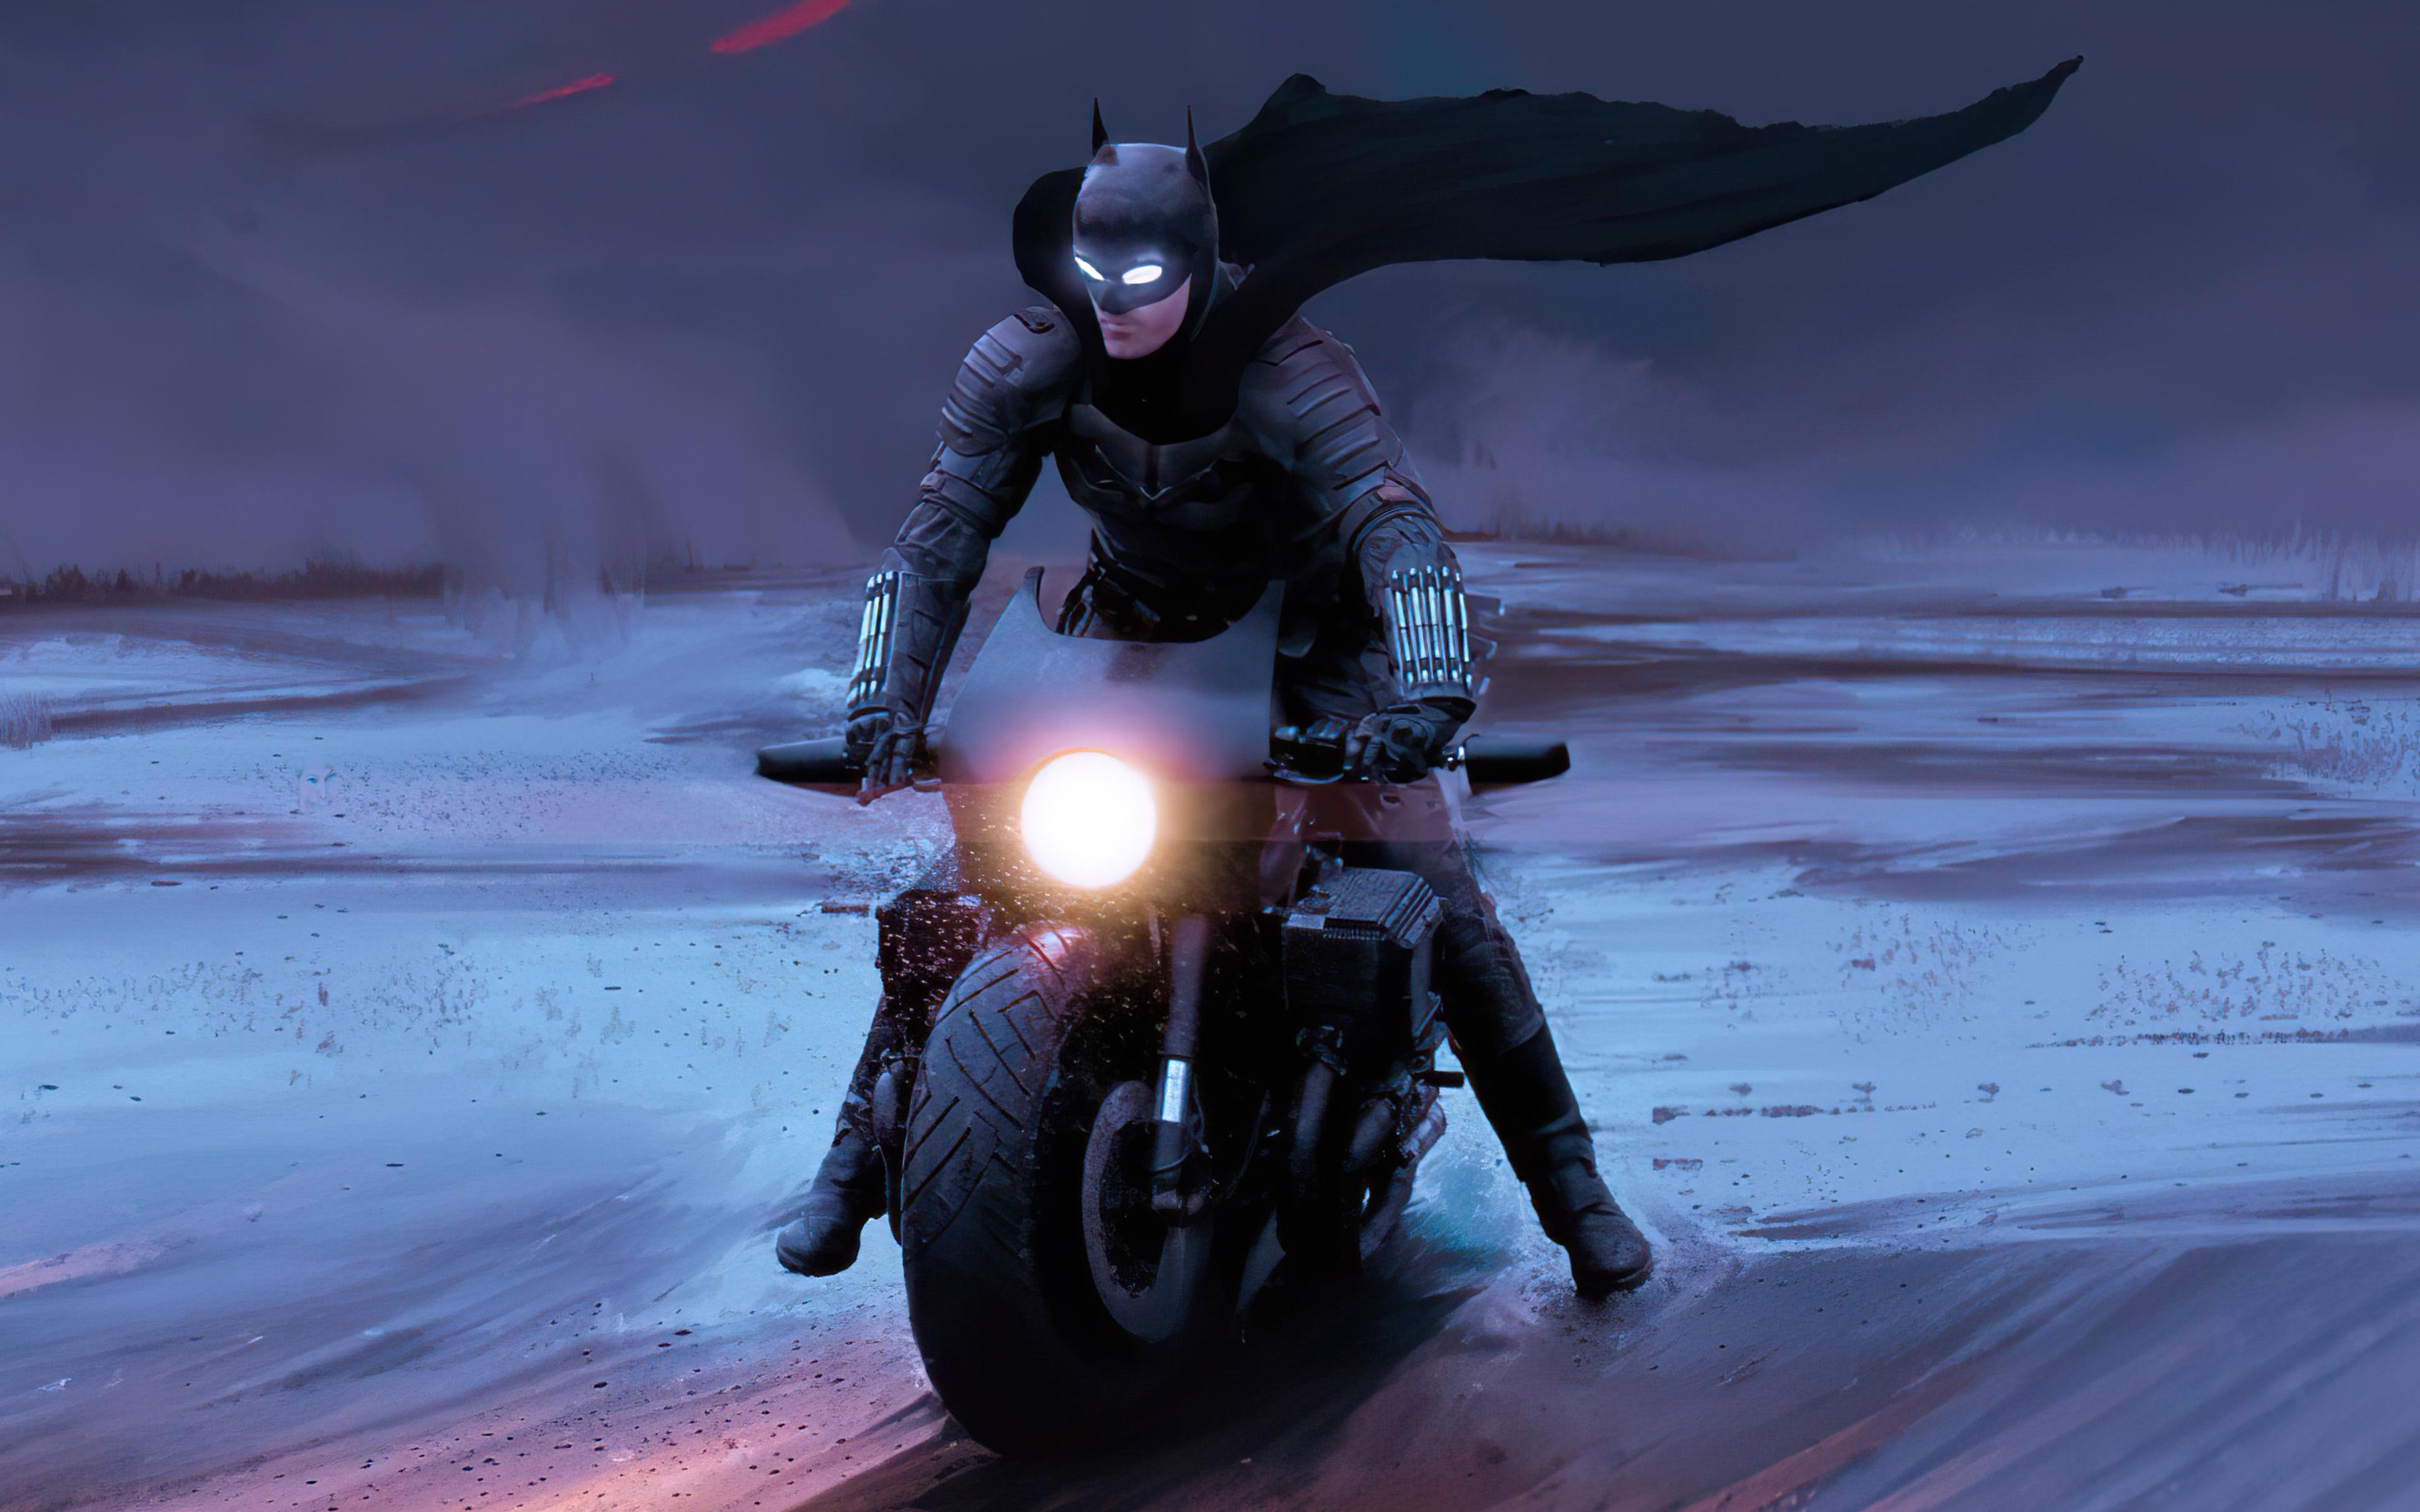 the-batman-batcycle-4k-b2.jpg